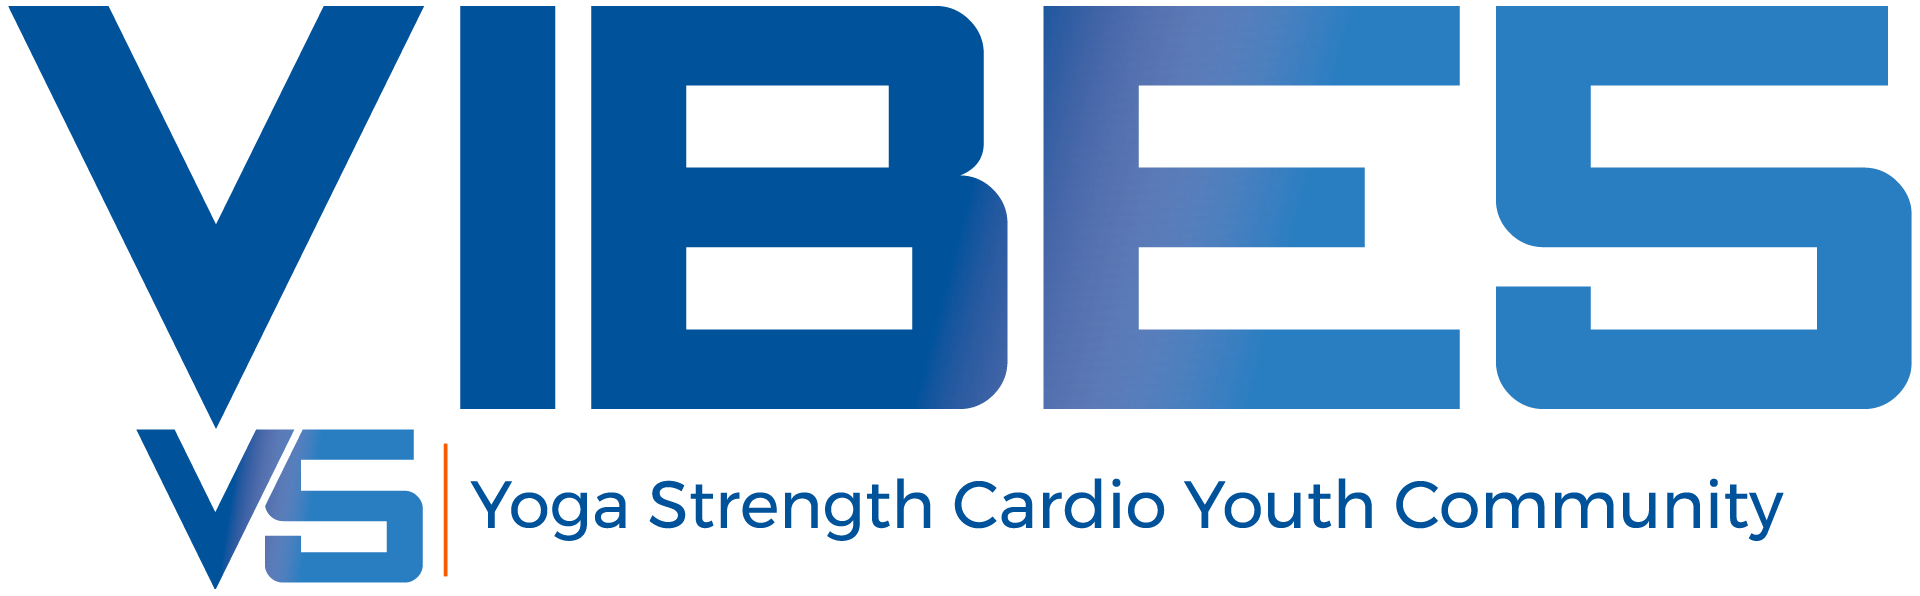 VIBE5 Yoga & Fitness